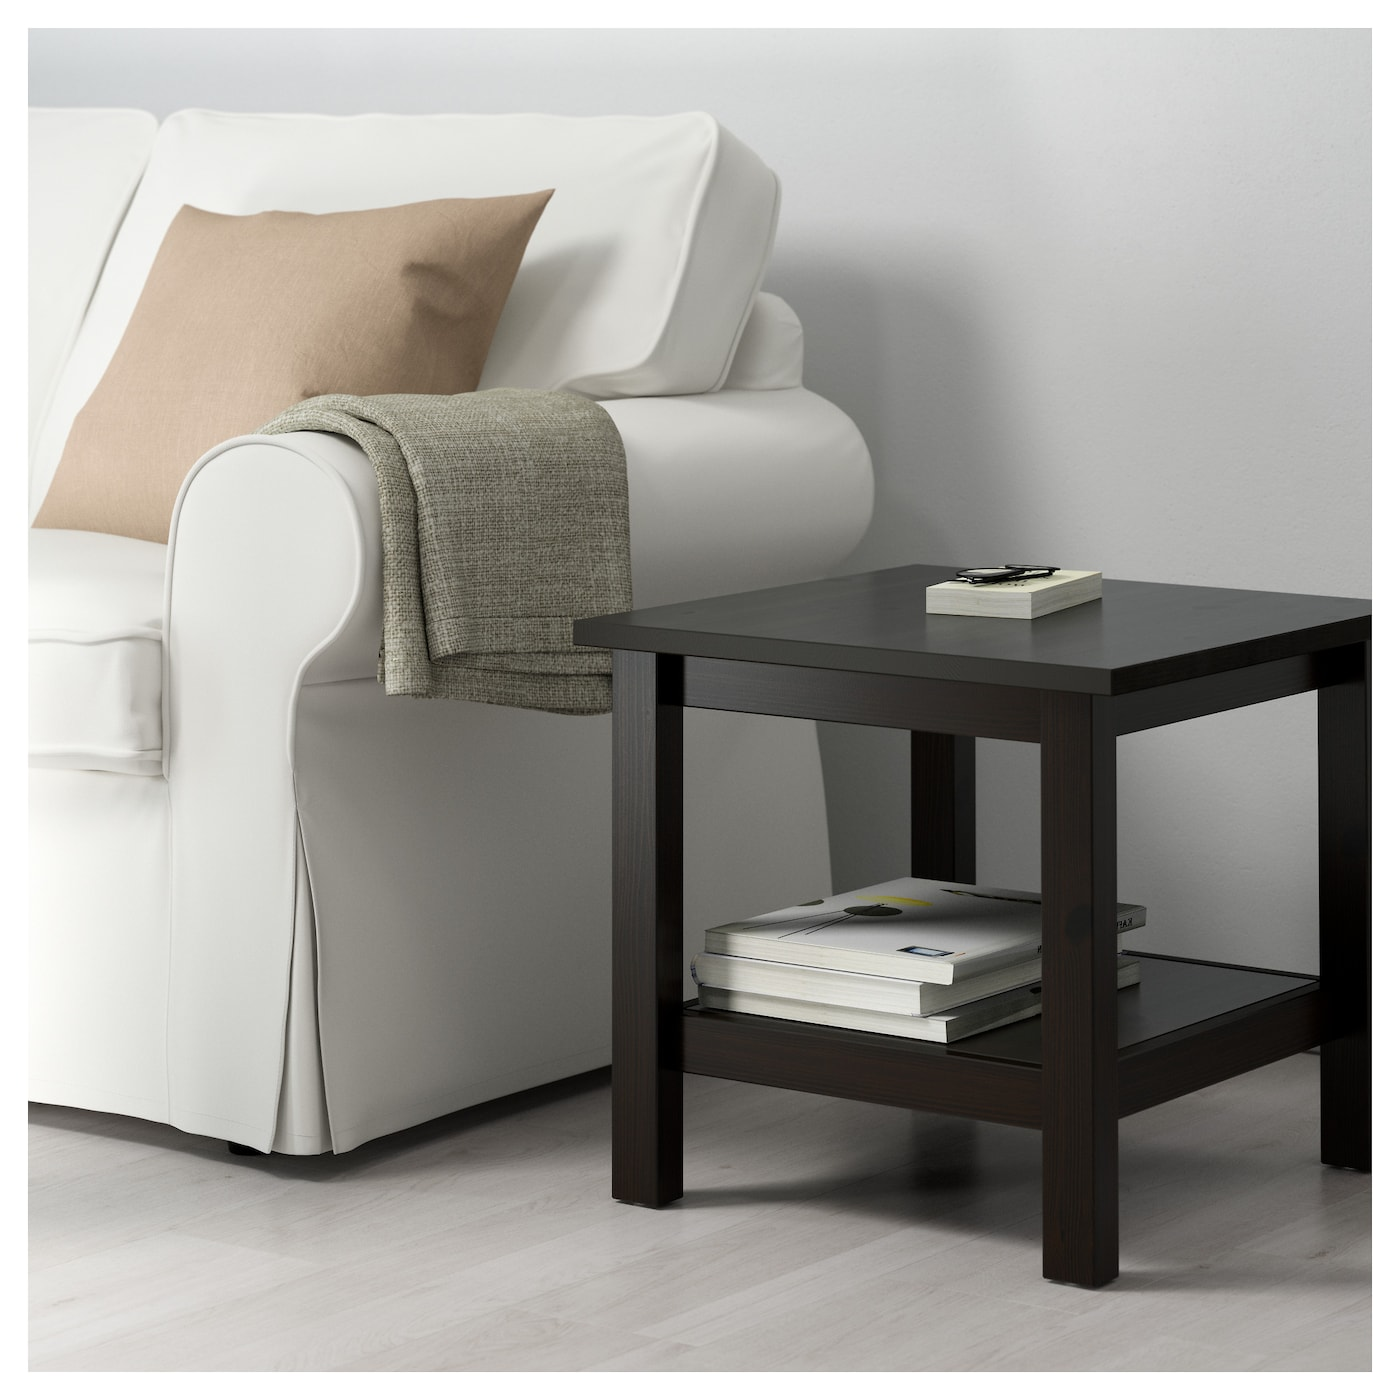 hemnes side table black brown 55x55 cm ikea